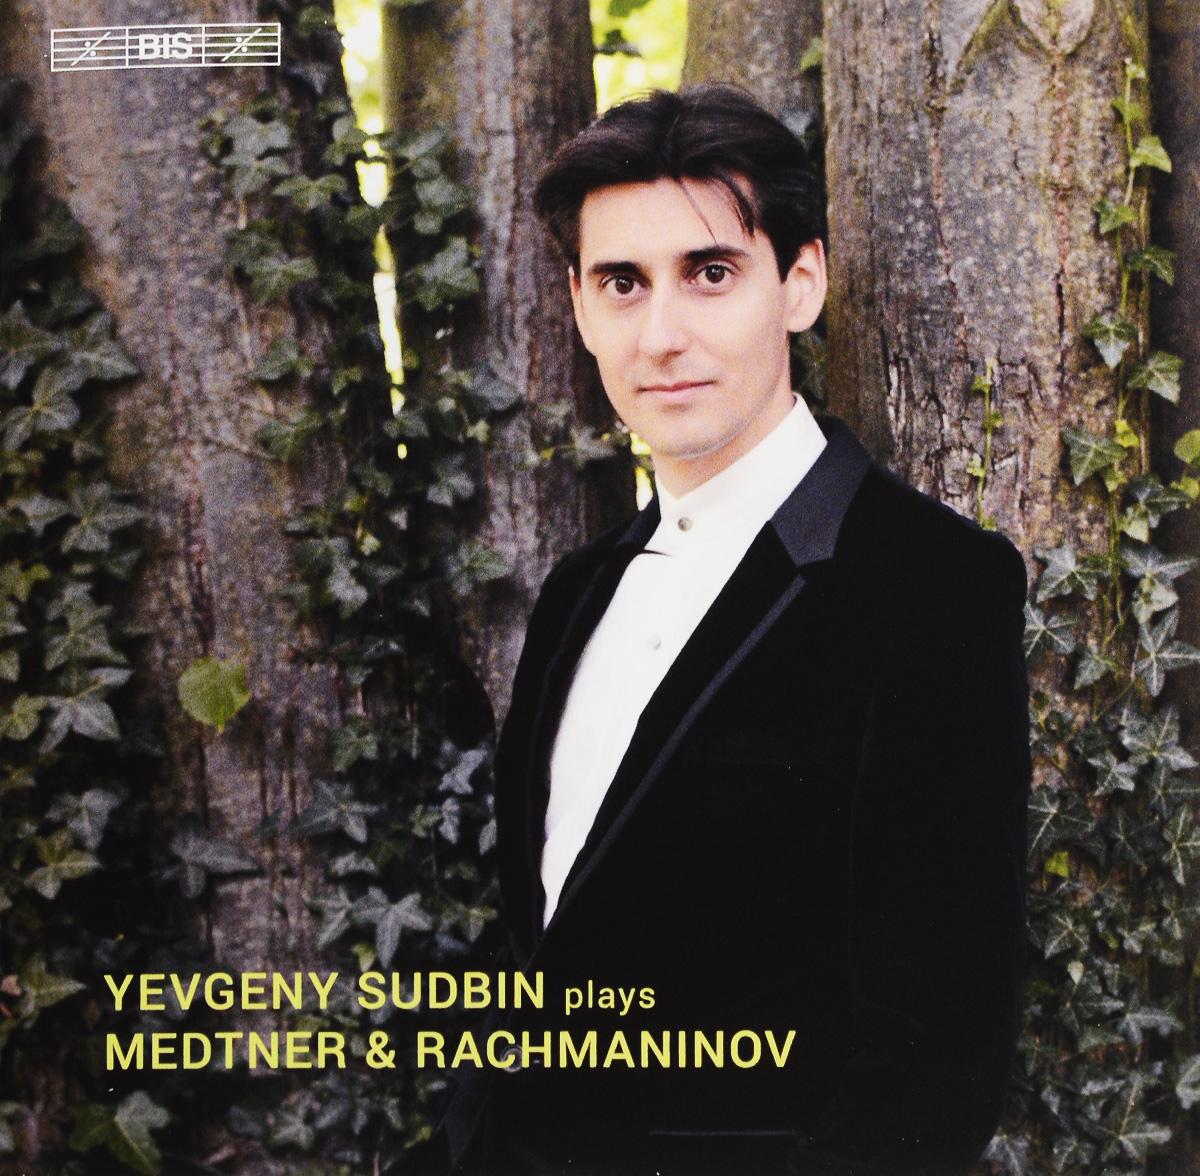 Евгений Судьбин Yevgeny Sudbin. Medtner, Rachmaninov (SACD)